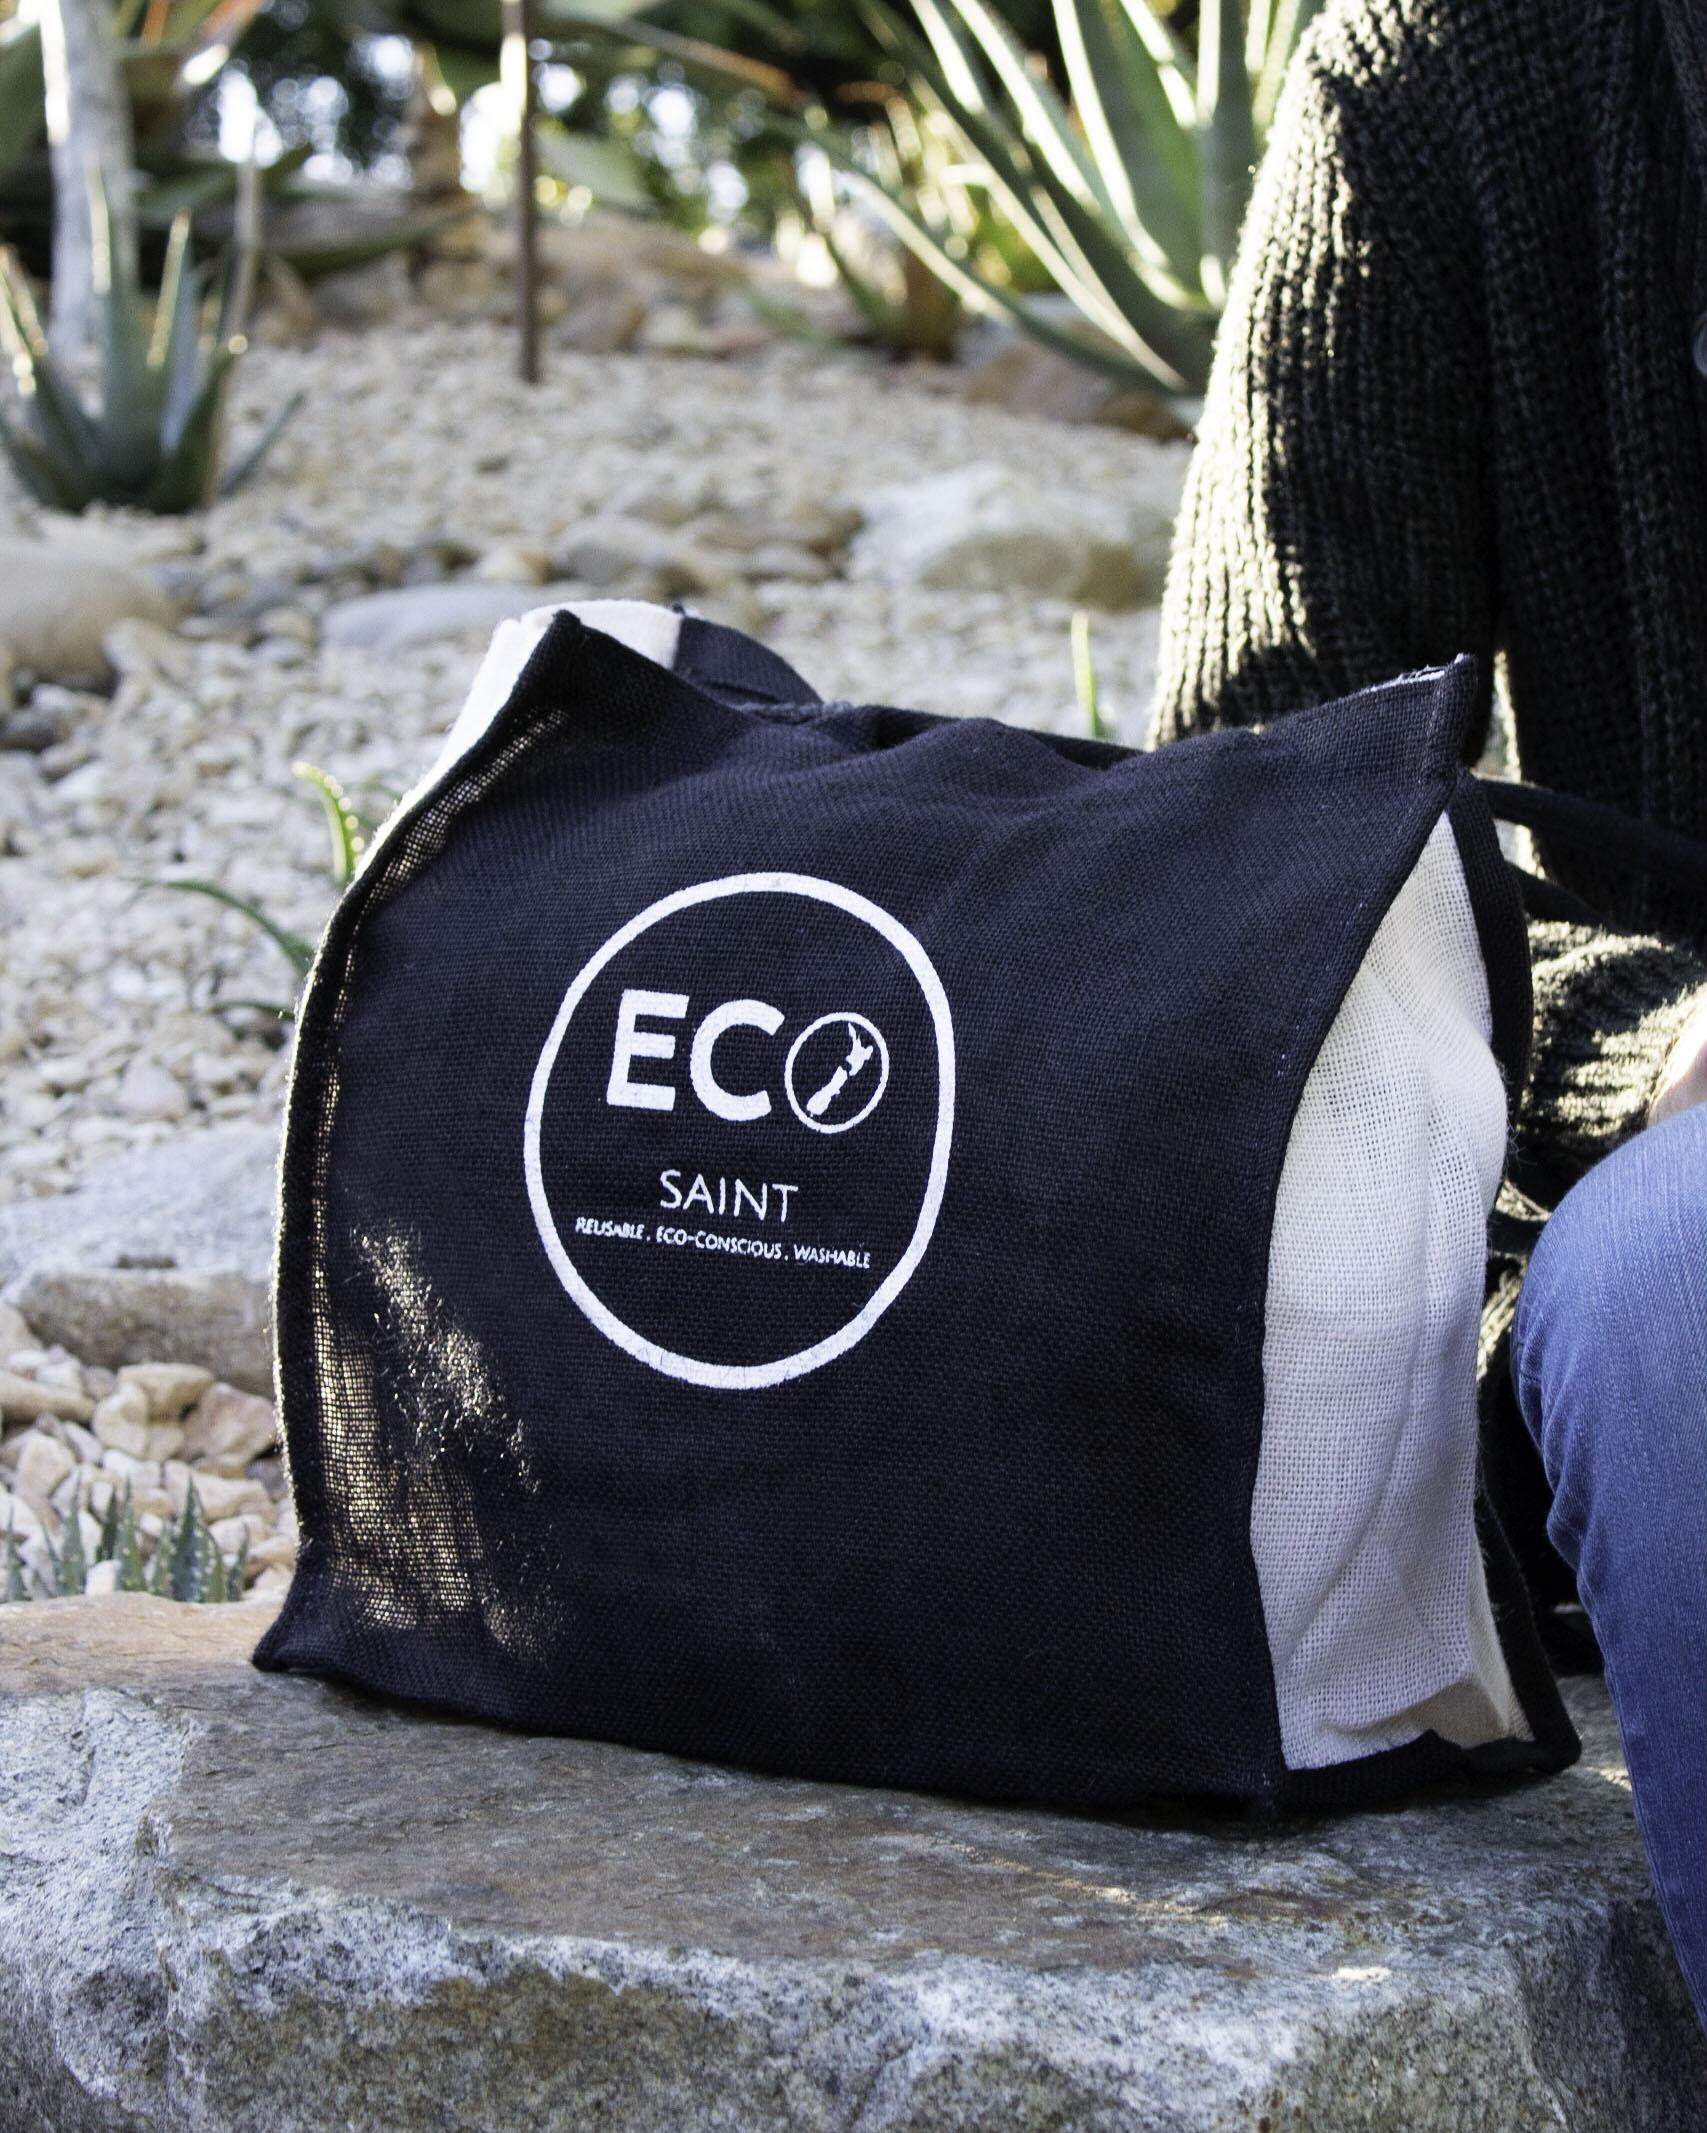 Eco Saint_8.jpg